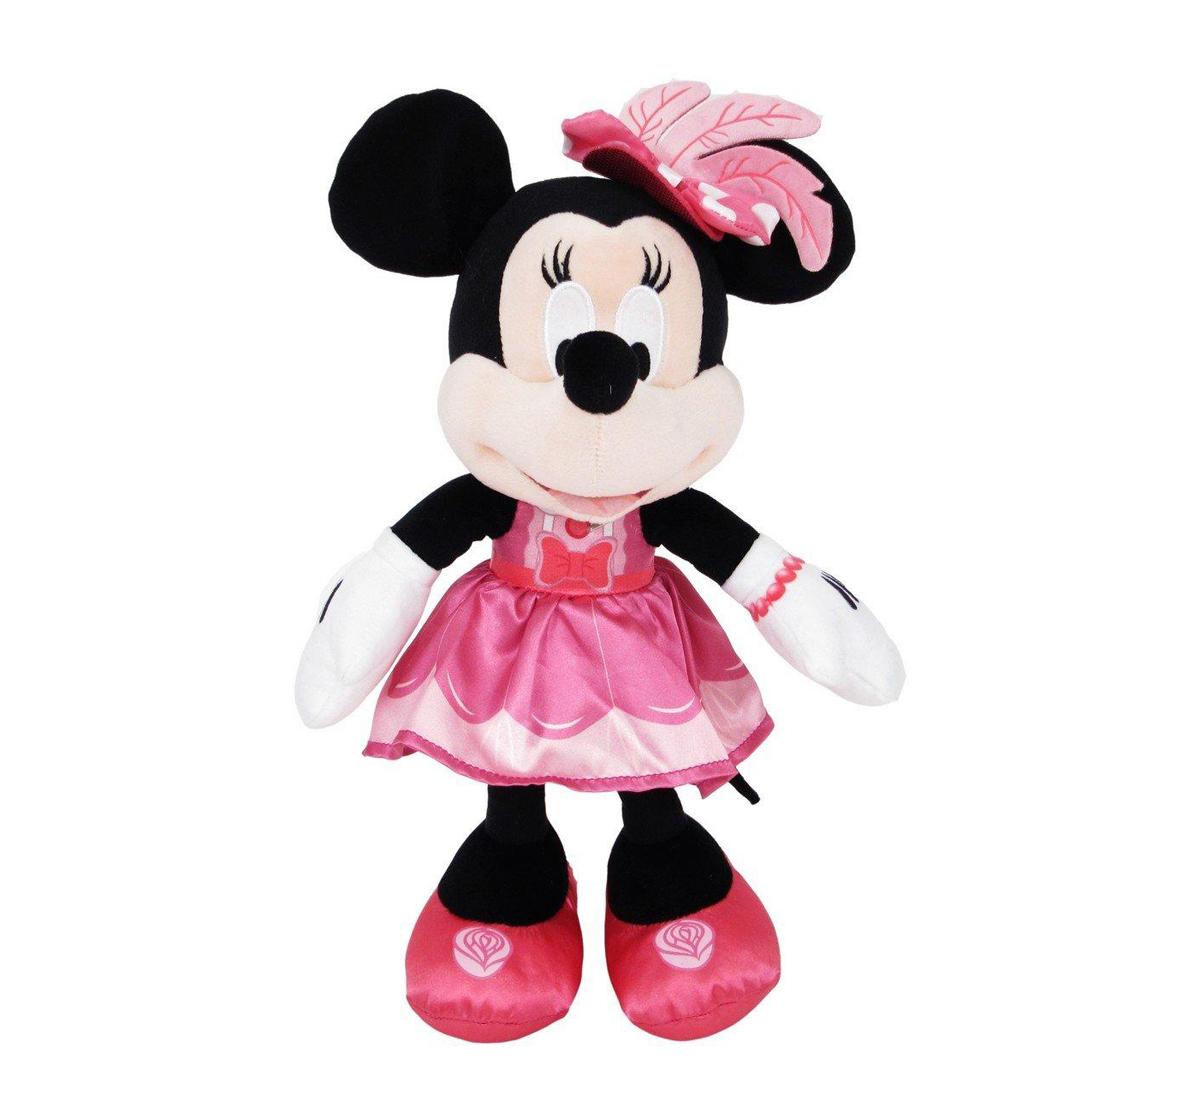 "Disney | Disney Minnie In Tea Time Dress Plush 10"" for Kids age 1Y+"